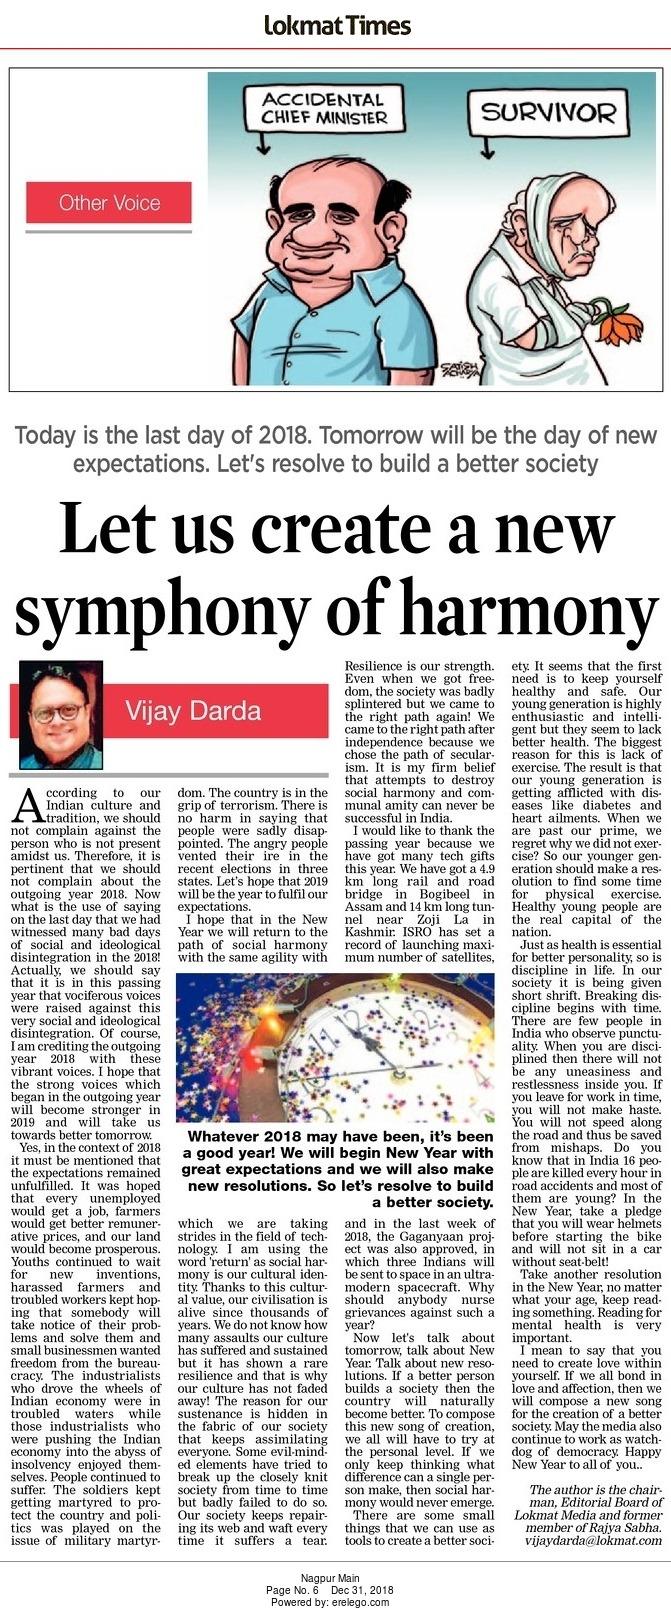 Let us create a new symphony of harmony